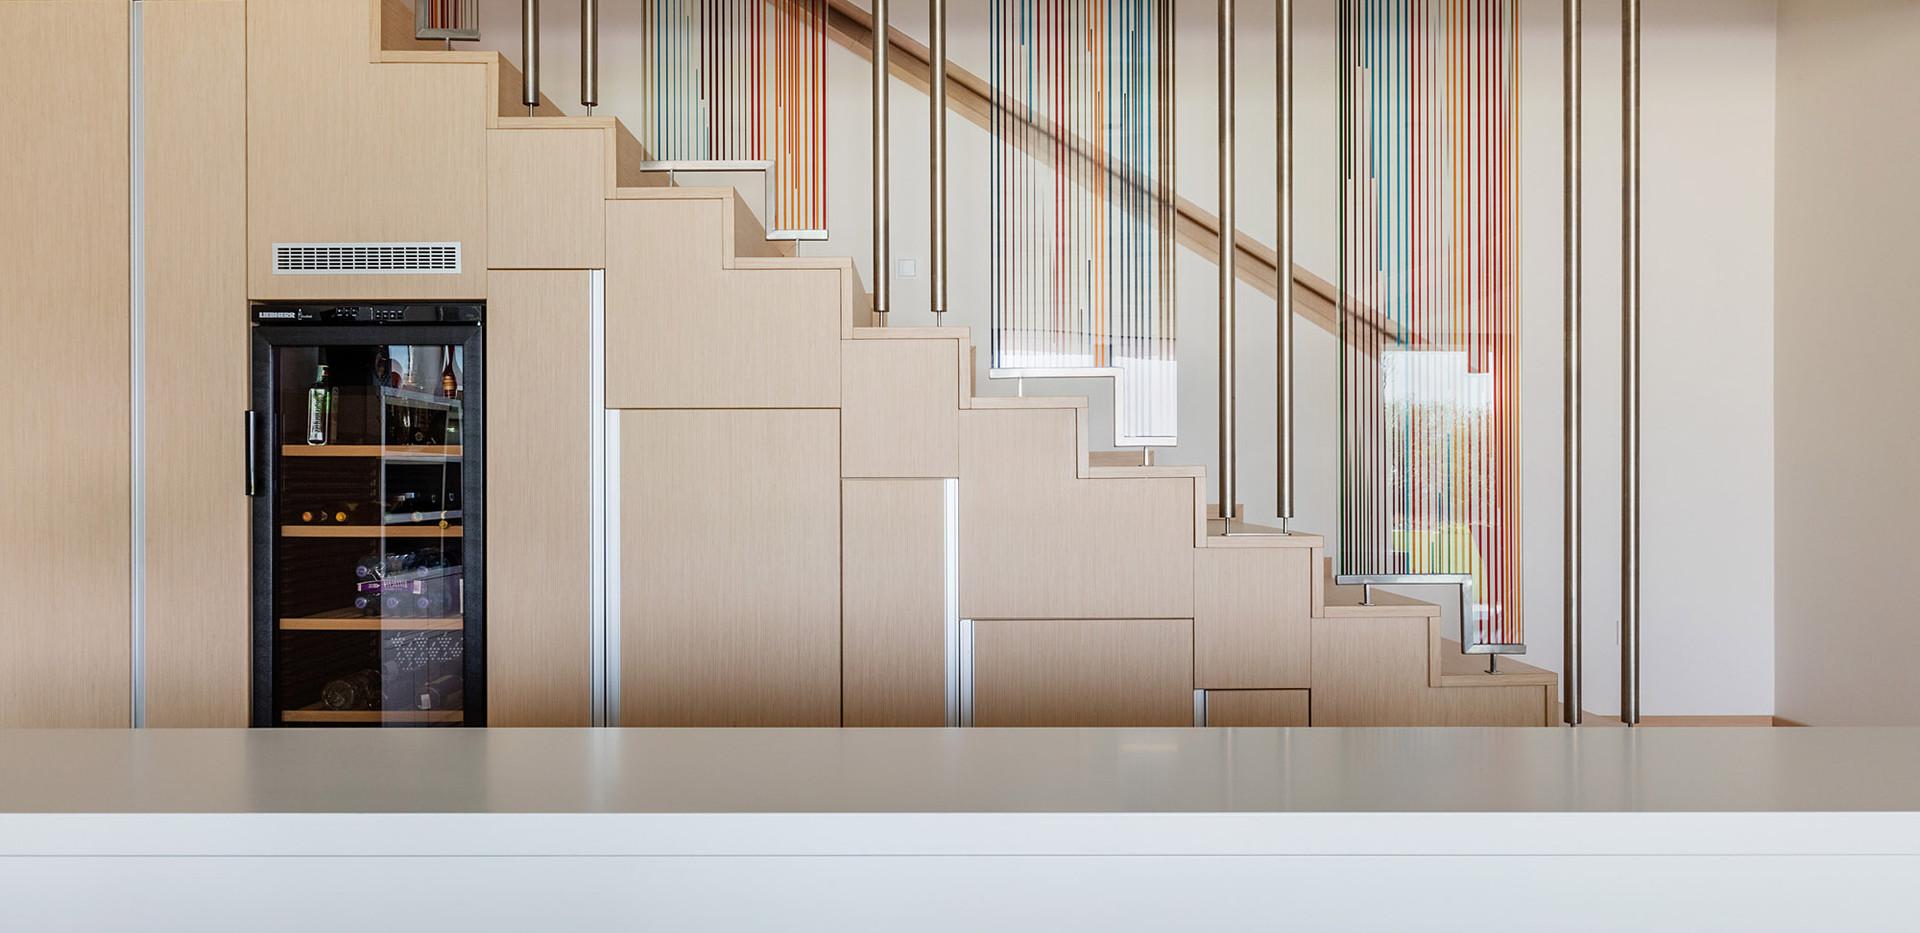 010-Balatonkenese-Demeter-Design-Studio-